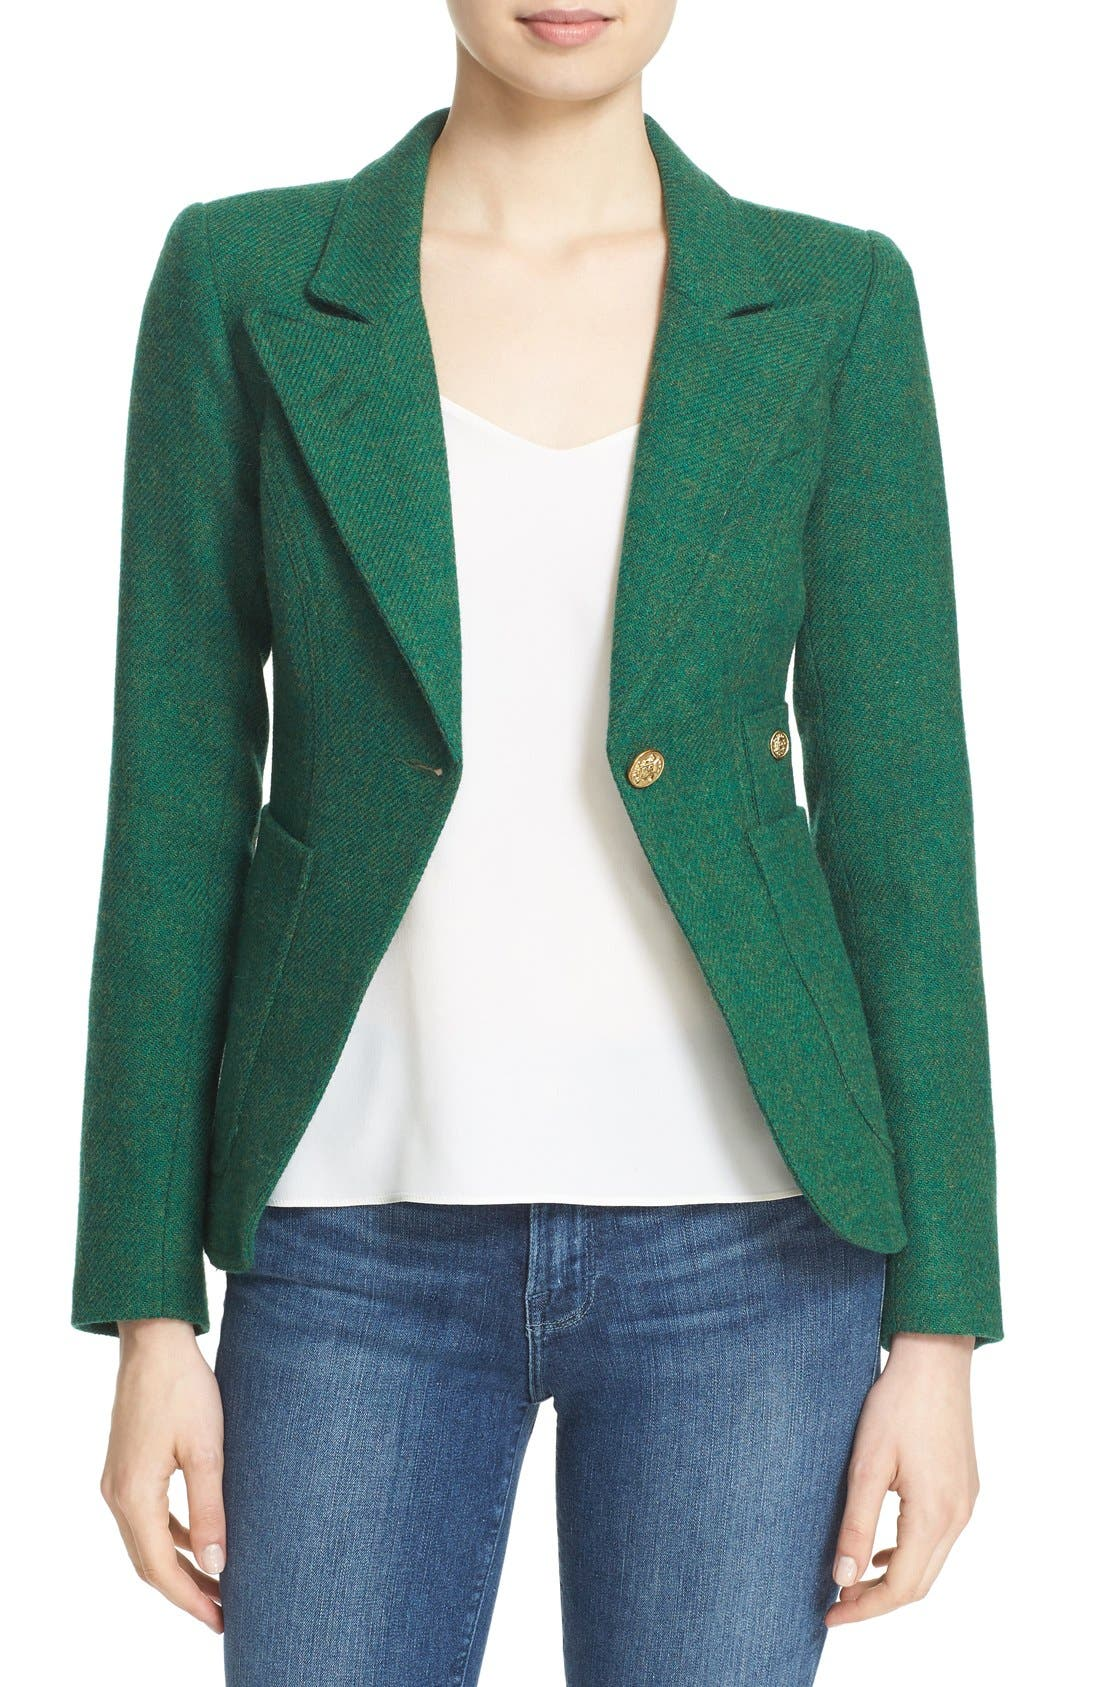 Alternate Image 1 Selected - Smythe 'Duchess' Suede Trim Wool Blend Blazer